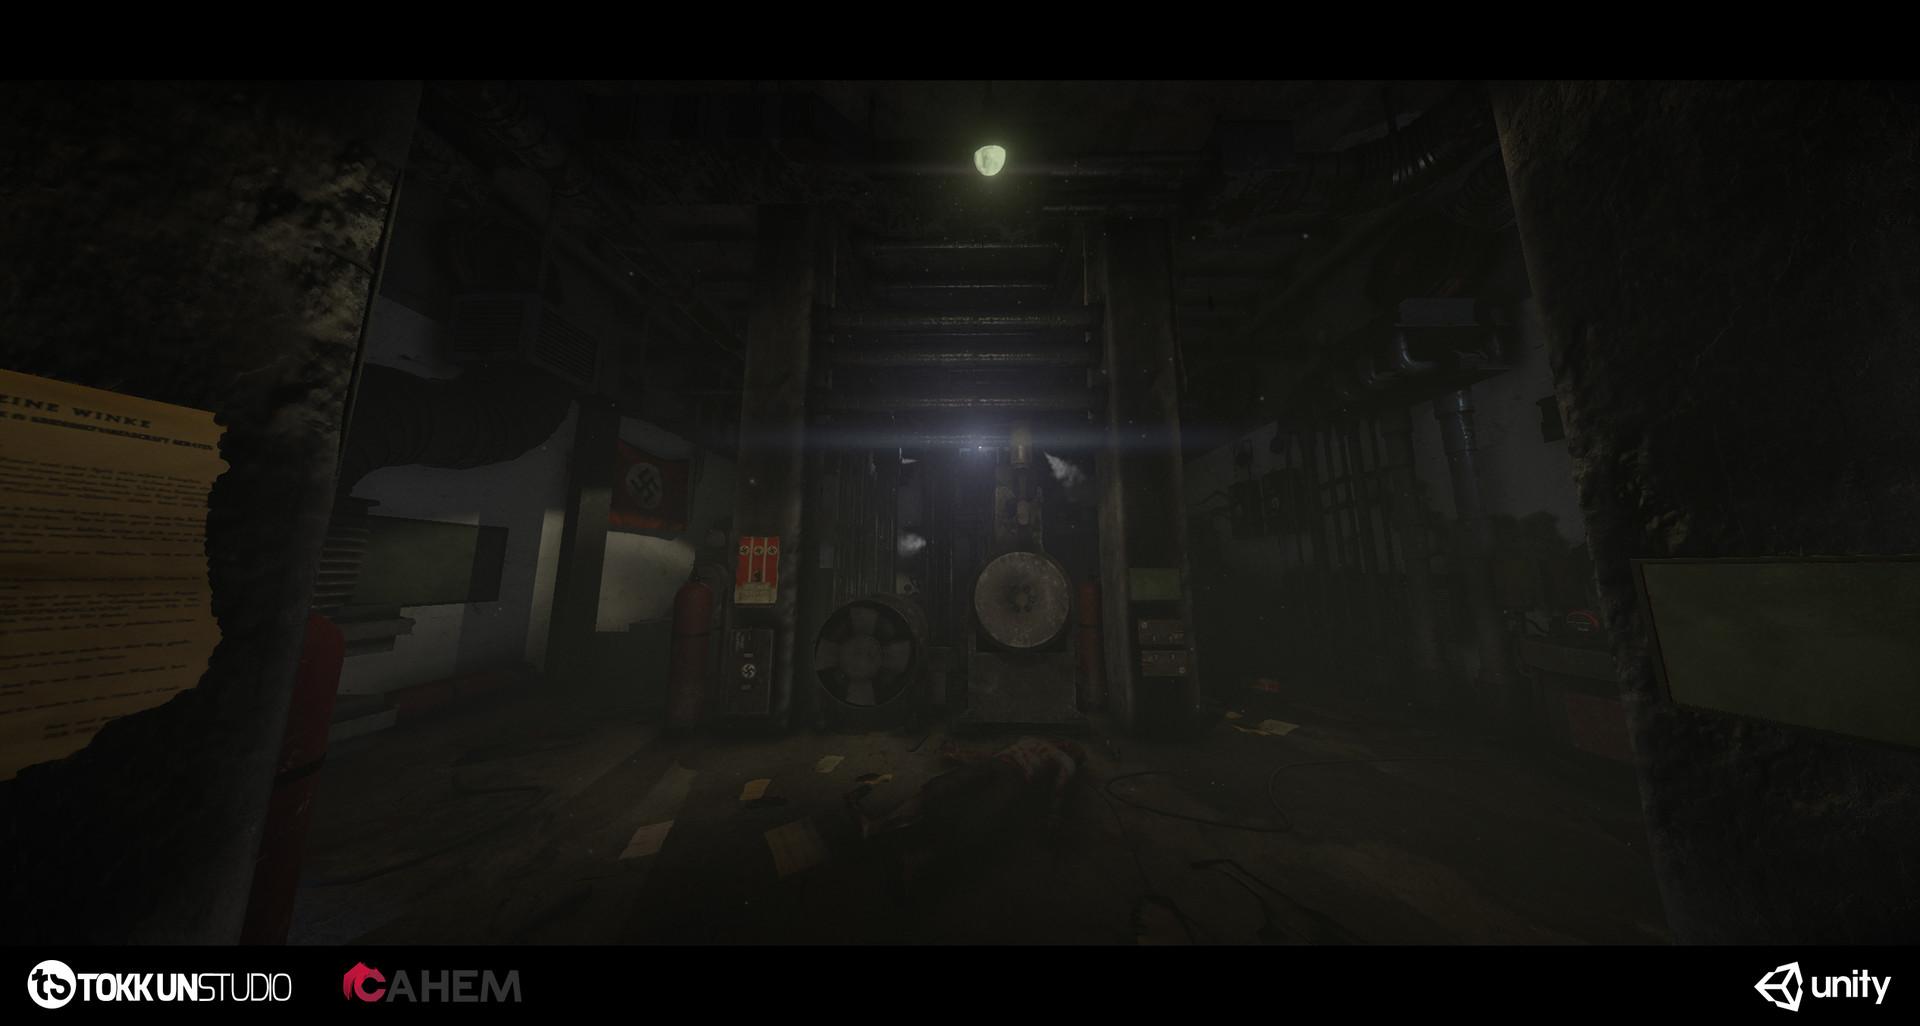 Tokkun studio bunker shot 22